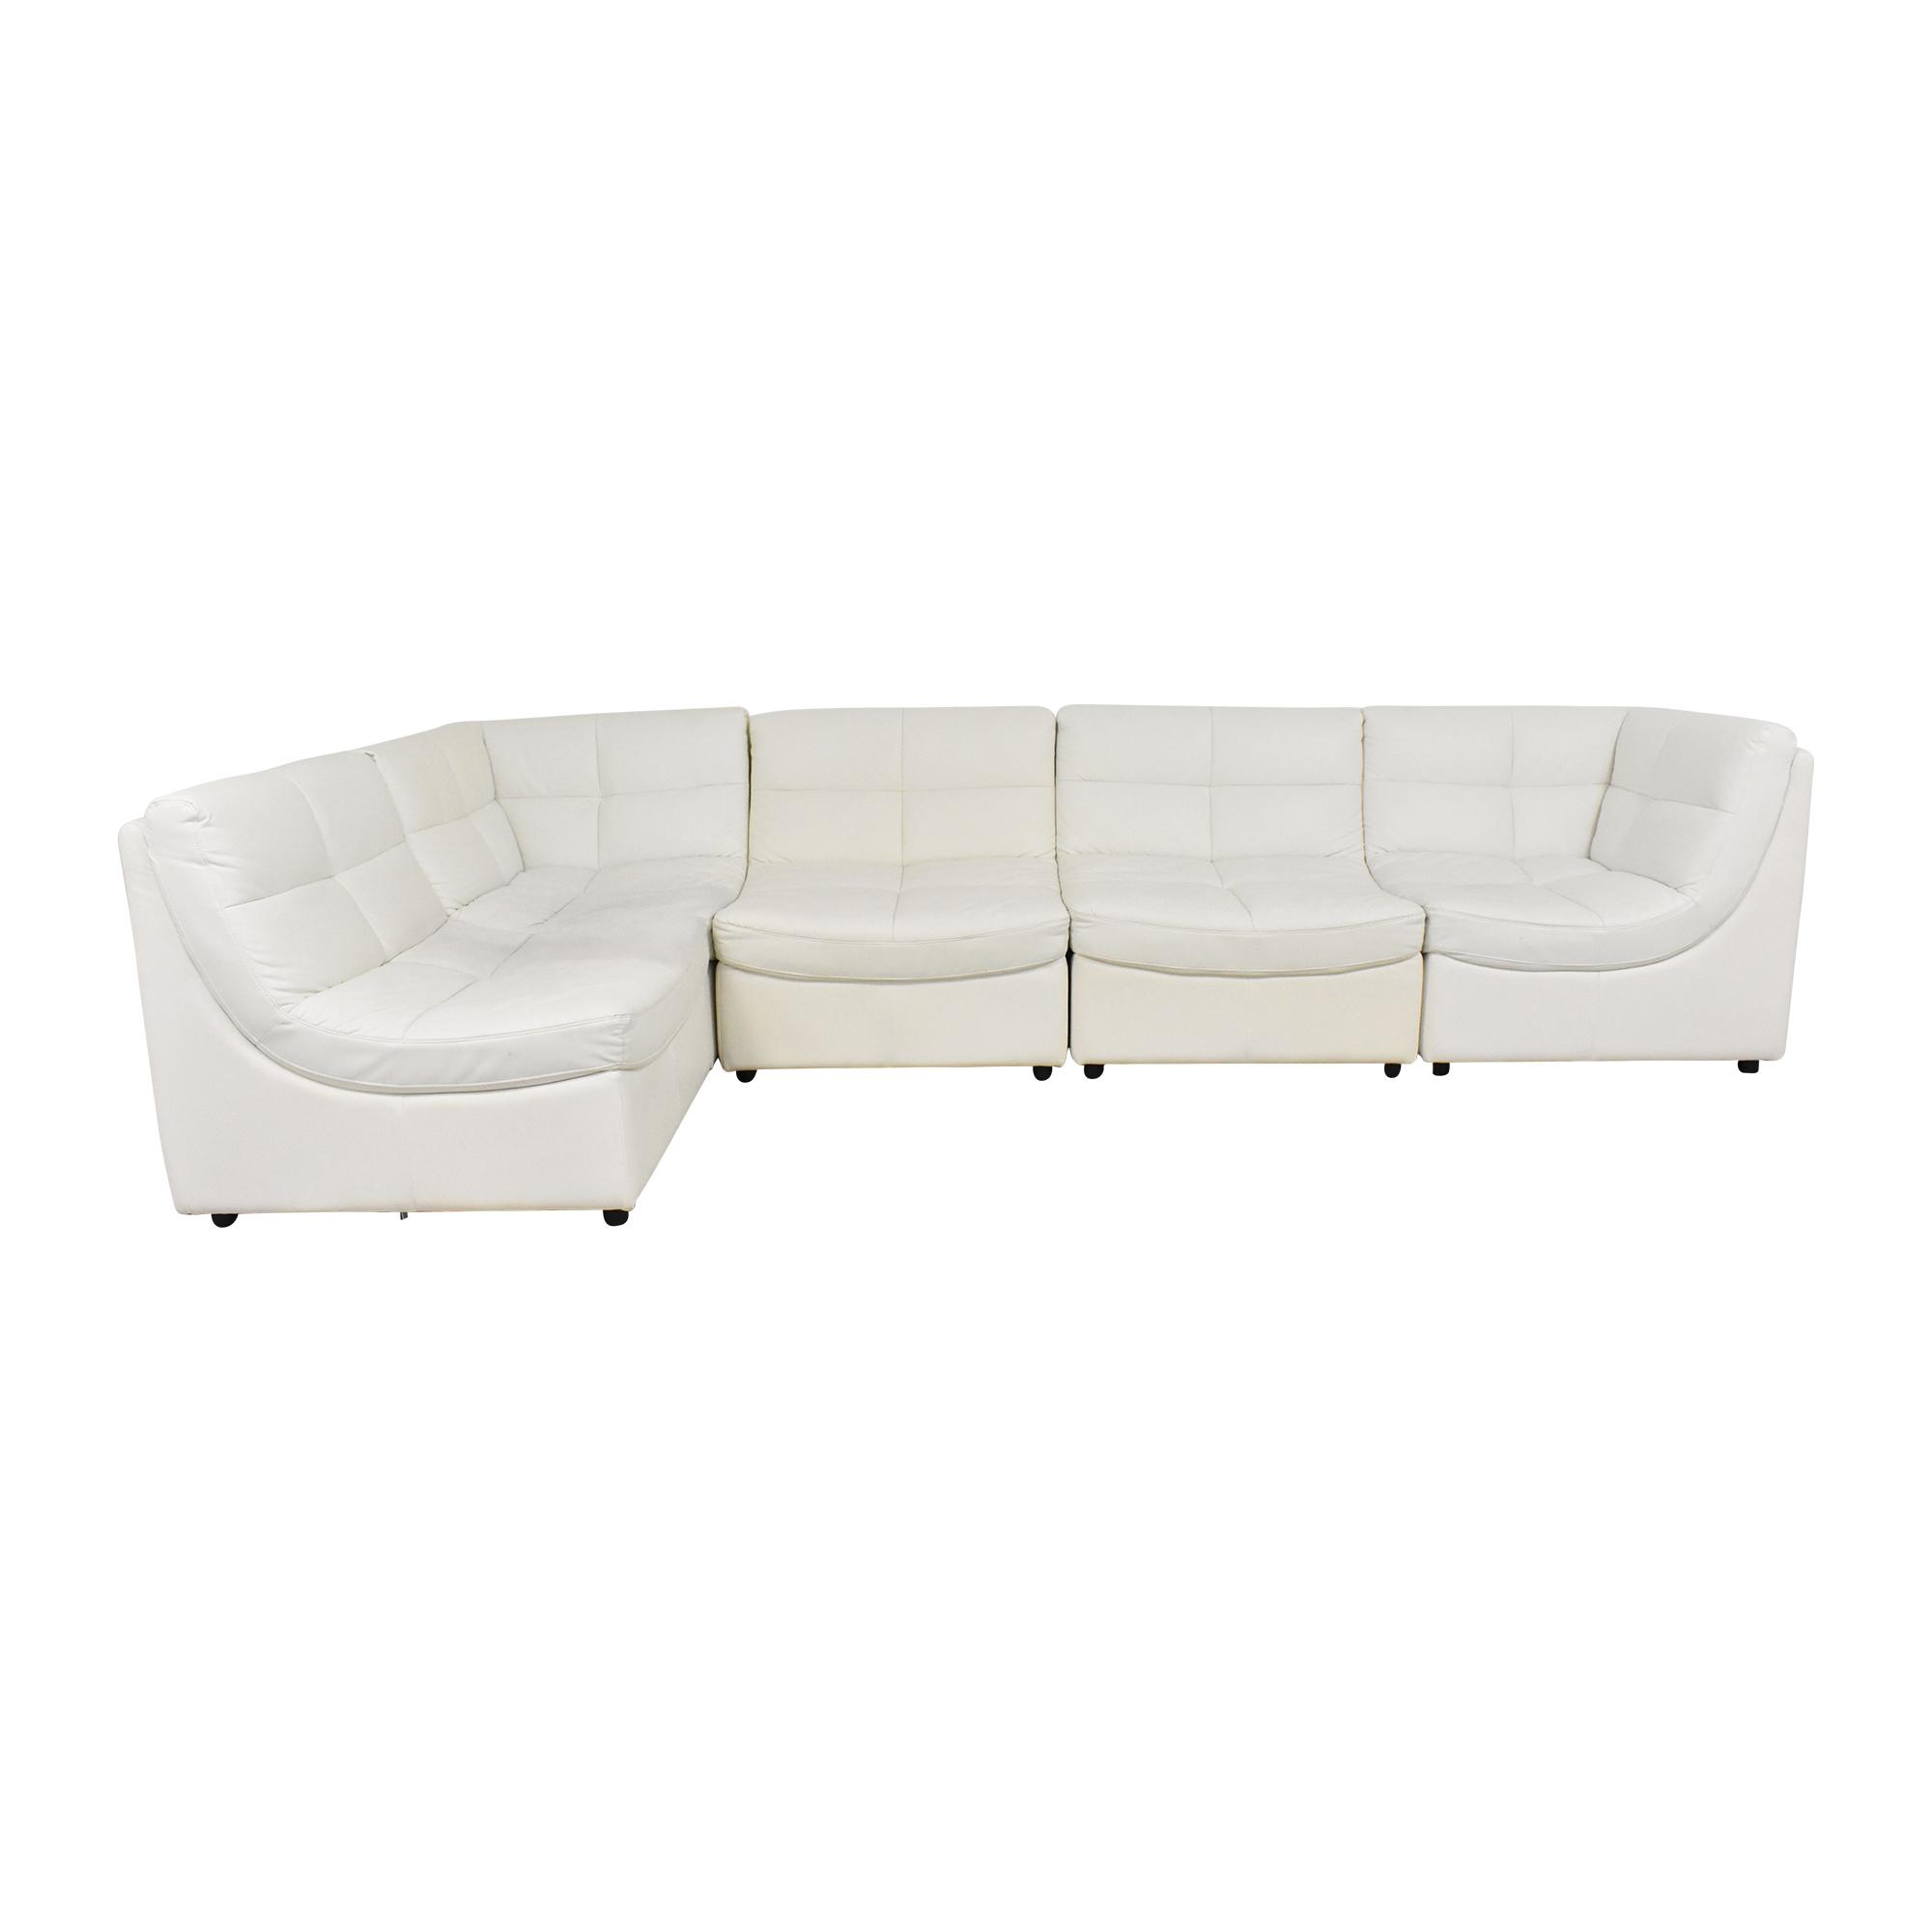 Corner Modular Sofa with Ottoman second hand